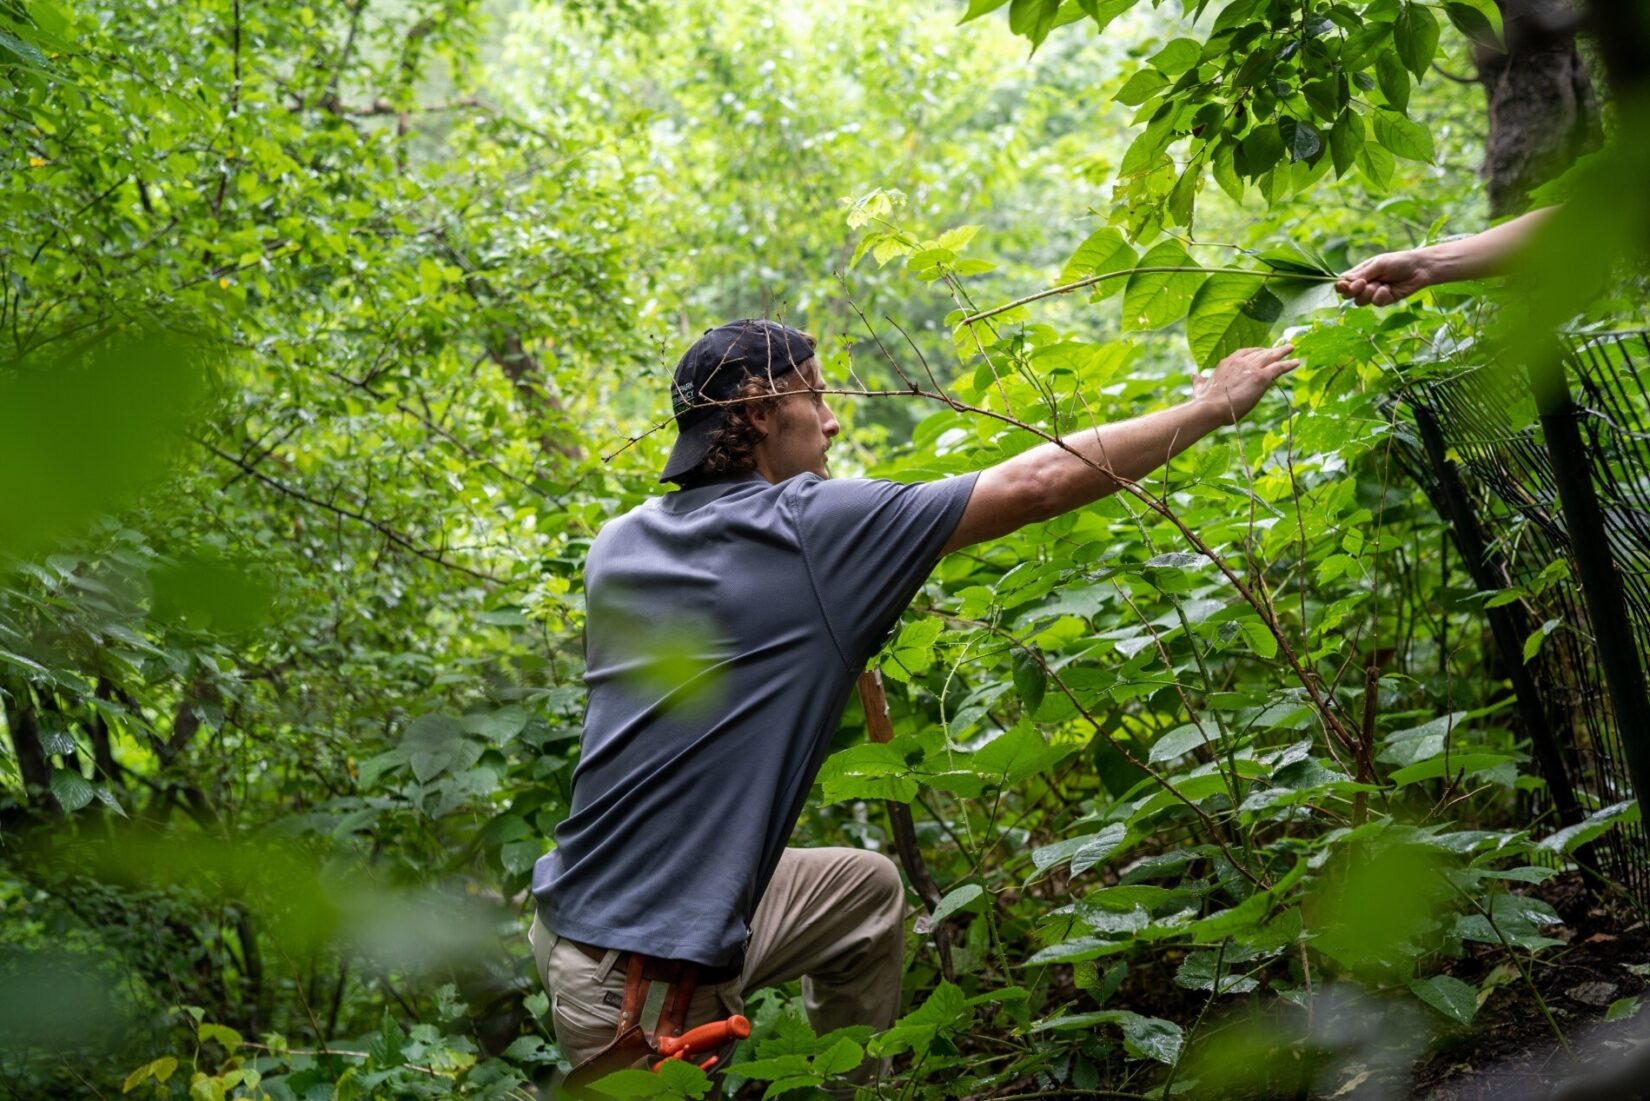 Conservancy worker Aubrey Carter, knee deep in underbrush, reaching toward a co-worker.